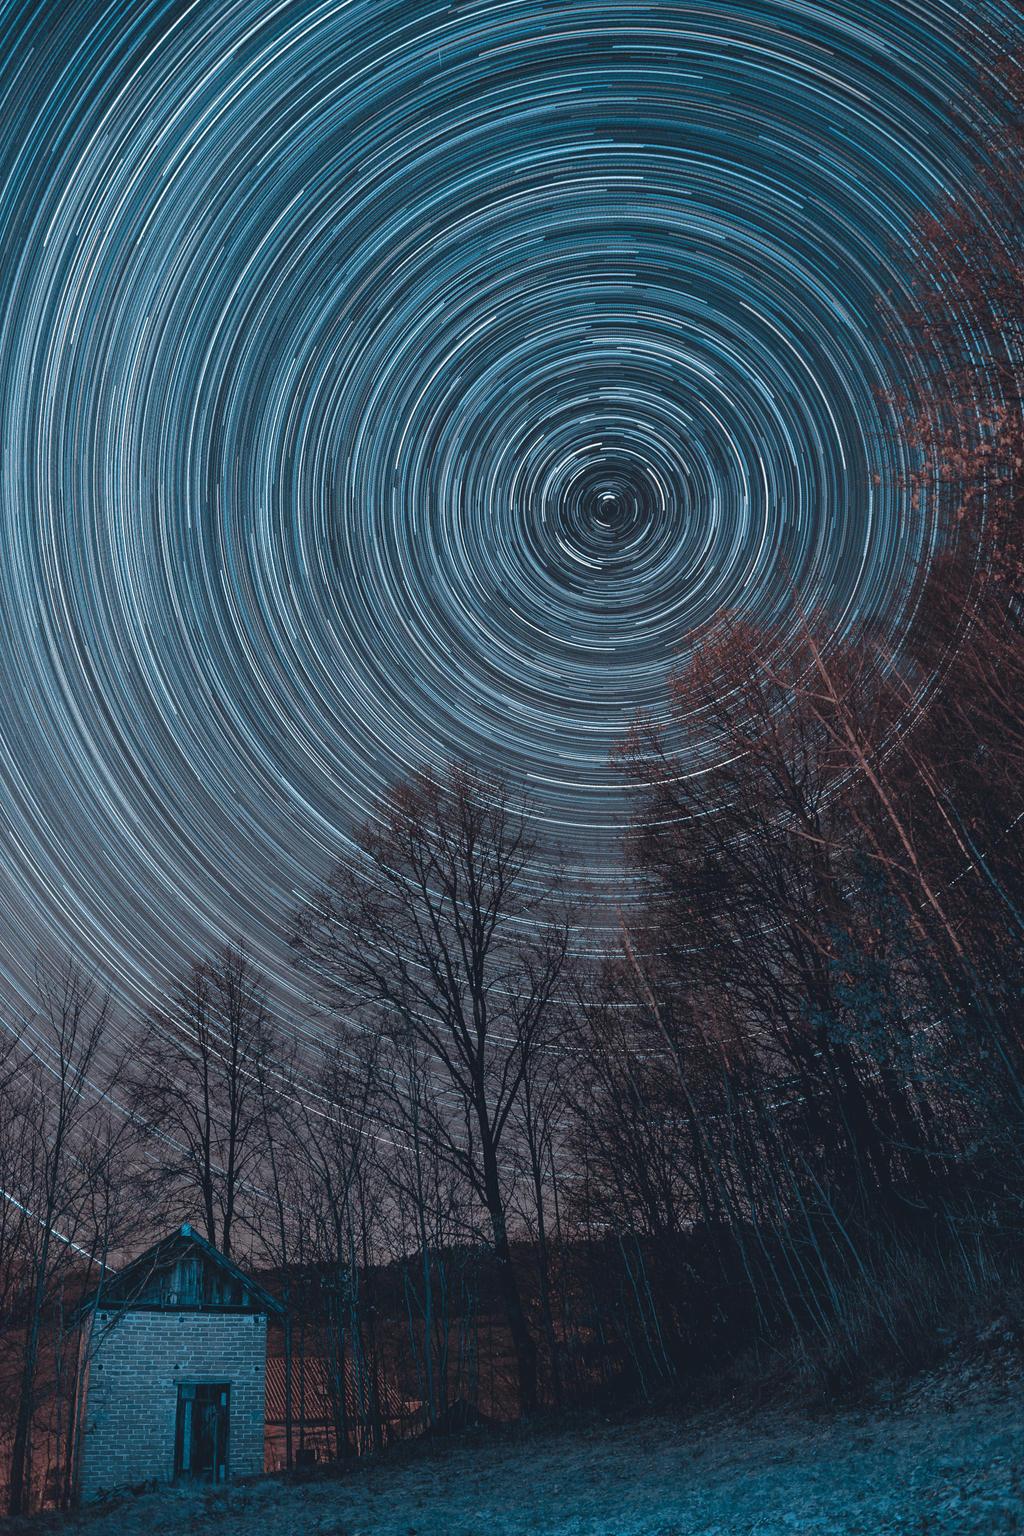 Hut under the stars by Boxxbeidl